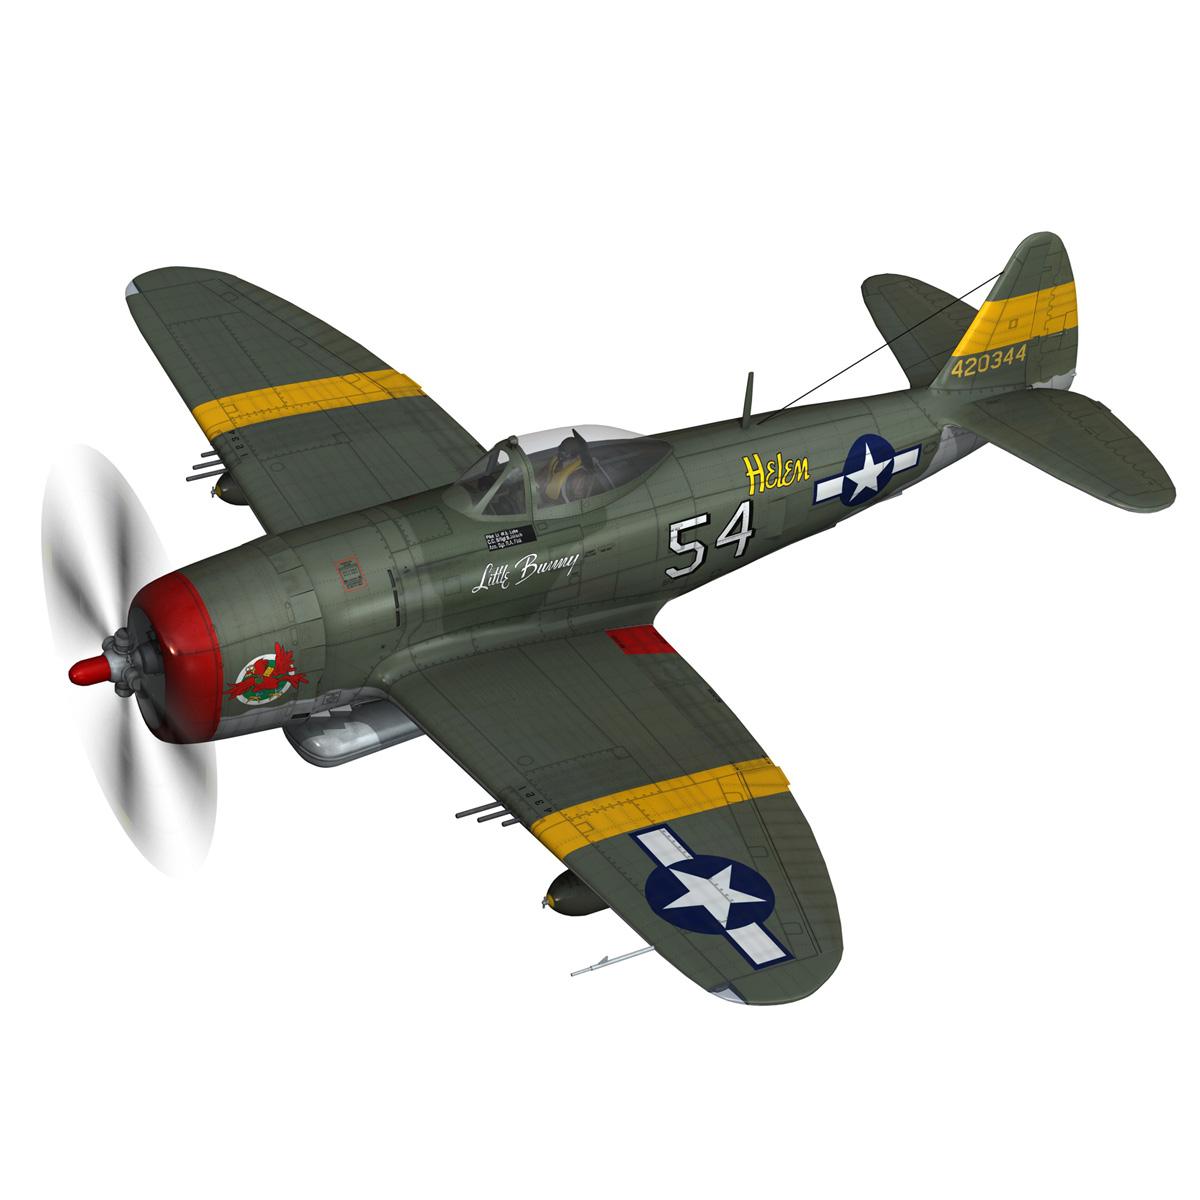 republic p-47d thunderbolt – little bunny 3d model fbx c4d lwo obj 274222